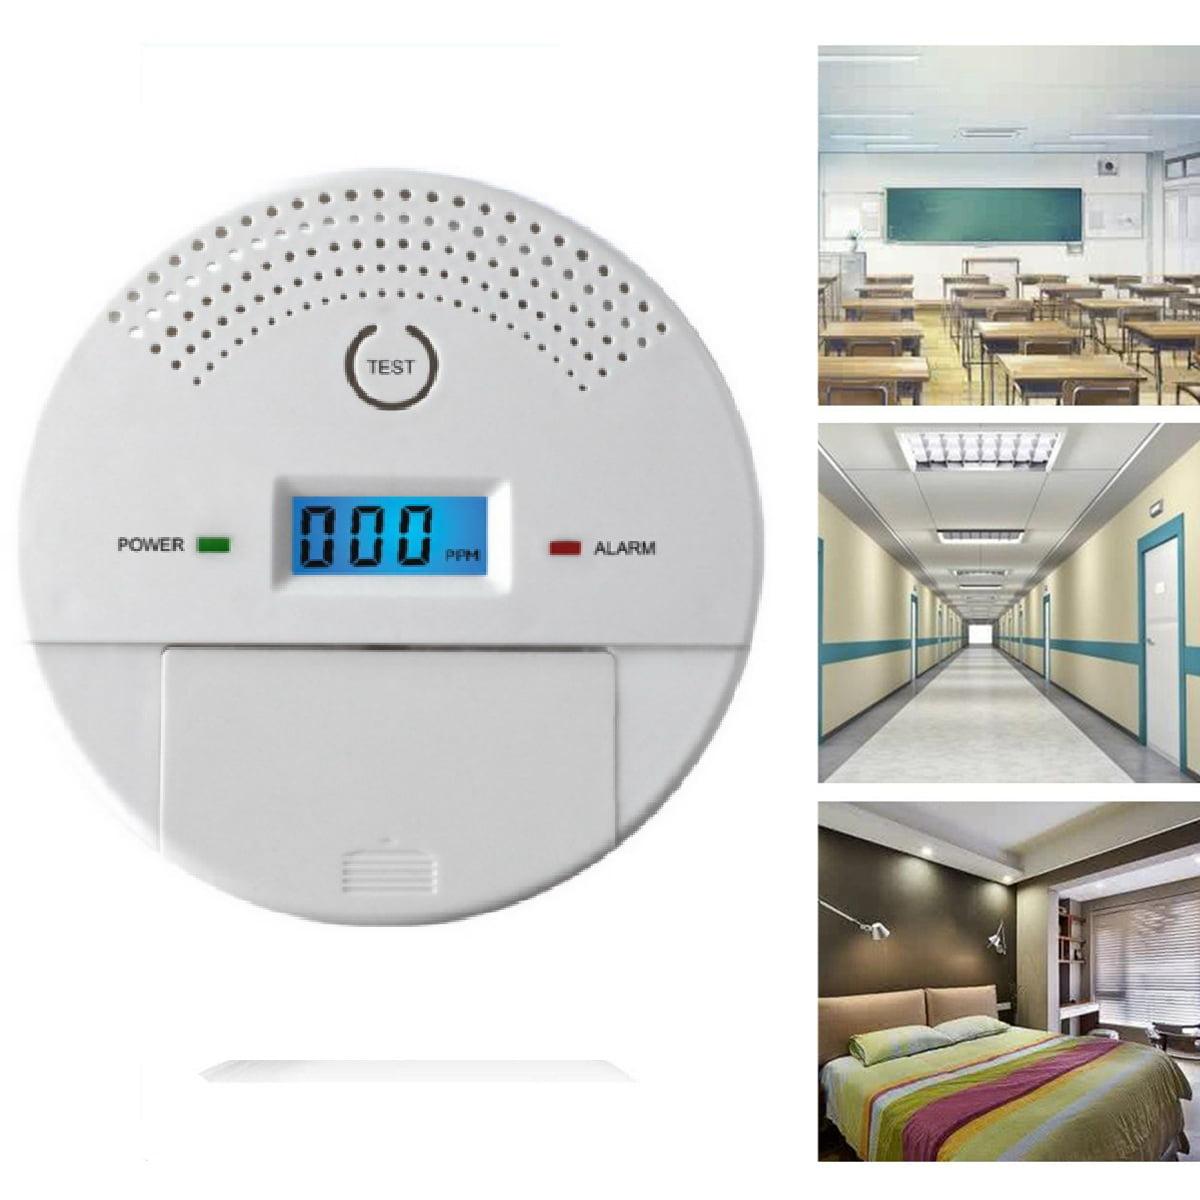 2 in 1 Carbon Monoxide&Smoke Alarm Smoke Fire Sensor CO Detector Gas Detection LCD Portable Security Gas CO Monitor Battery Powered